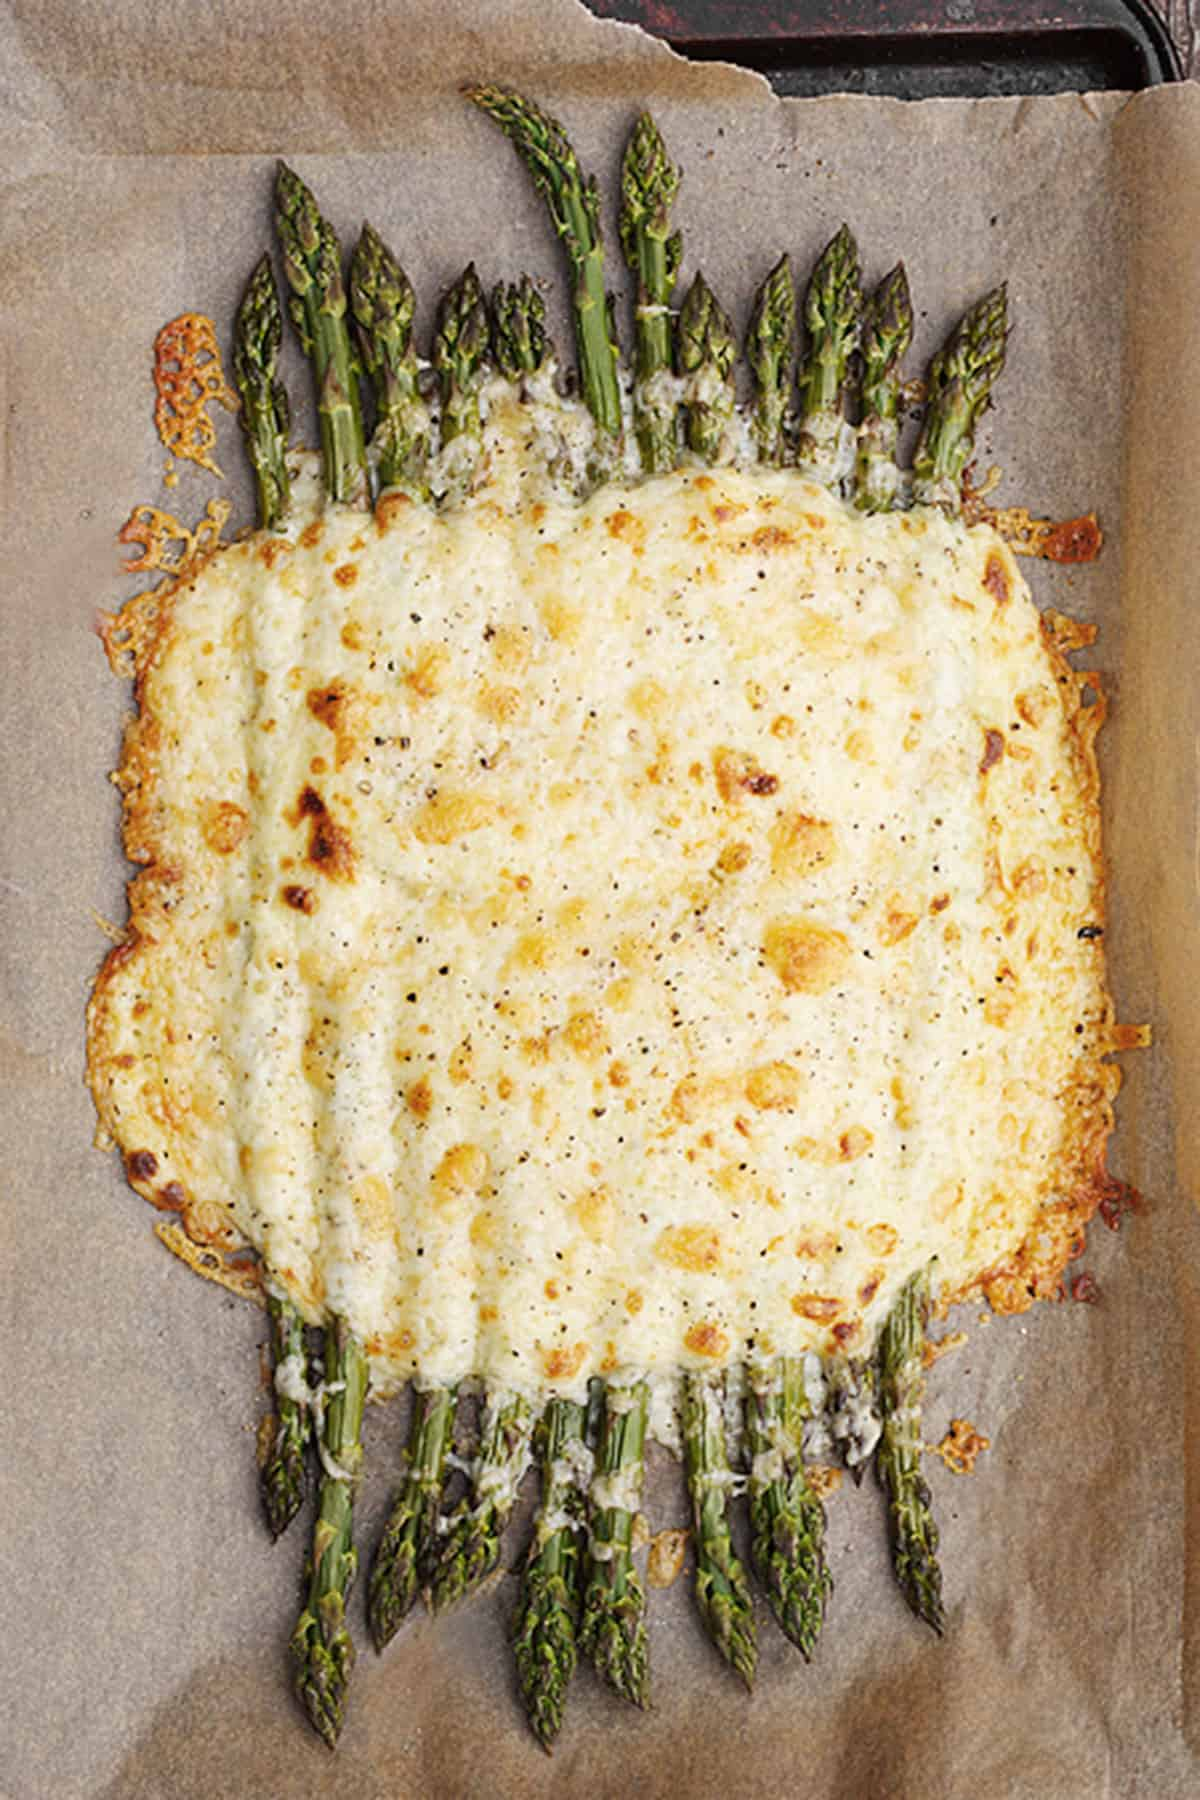 baked asparagus with creamy cheese sauce